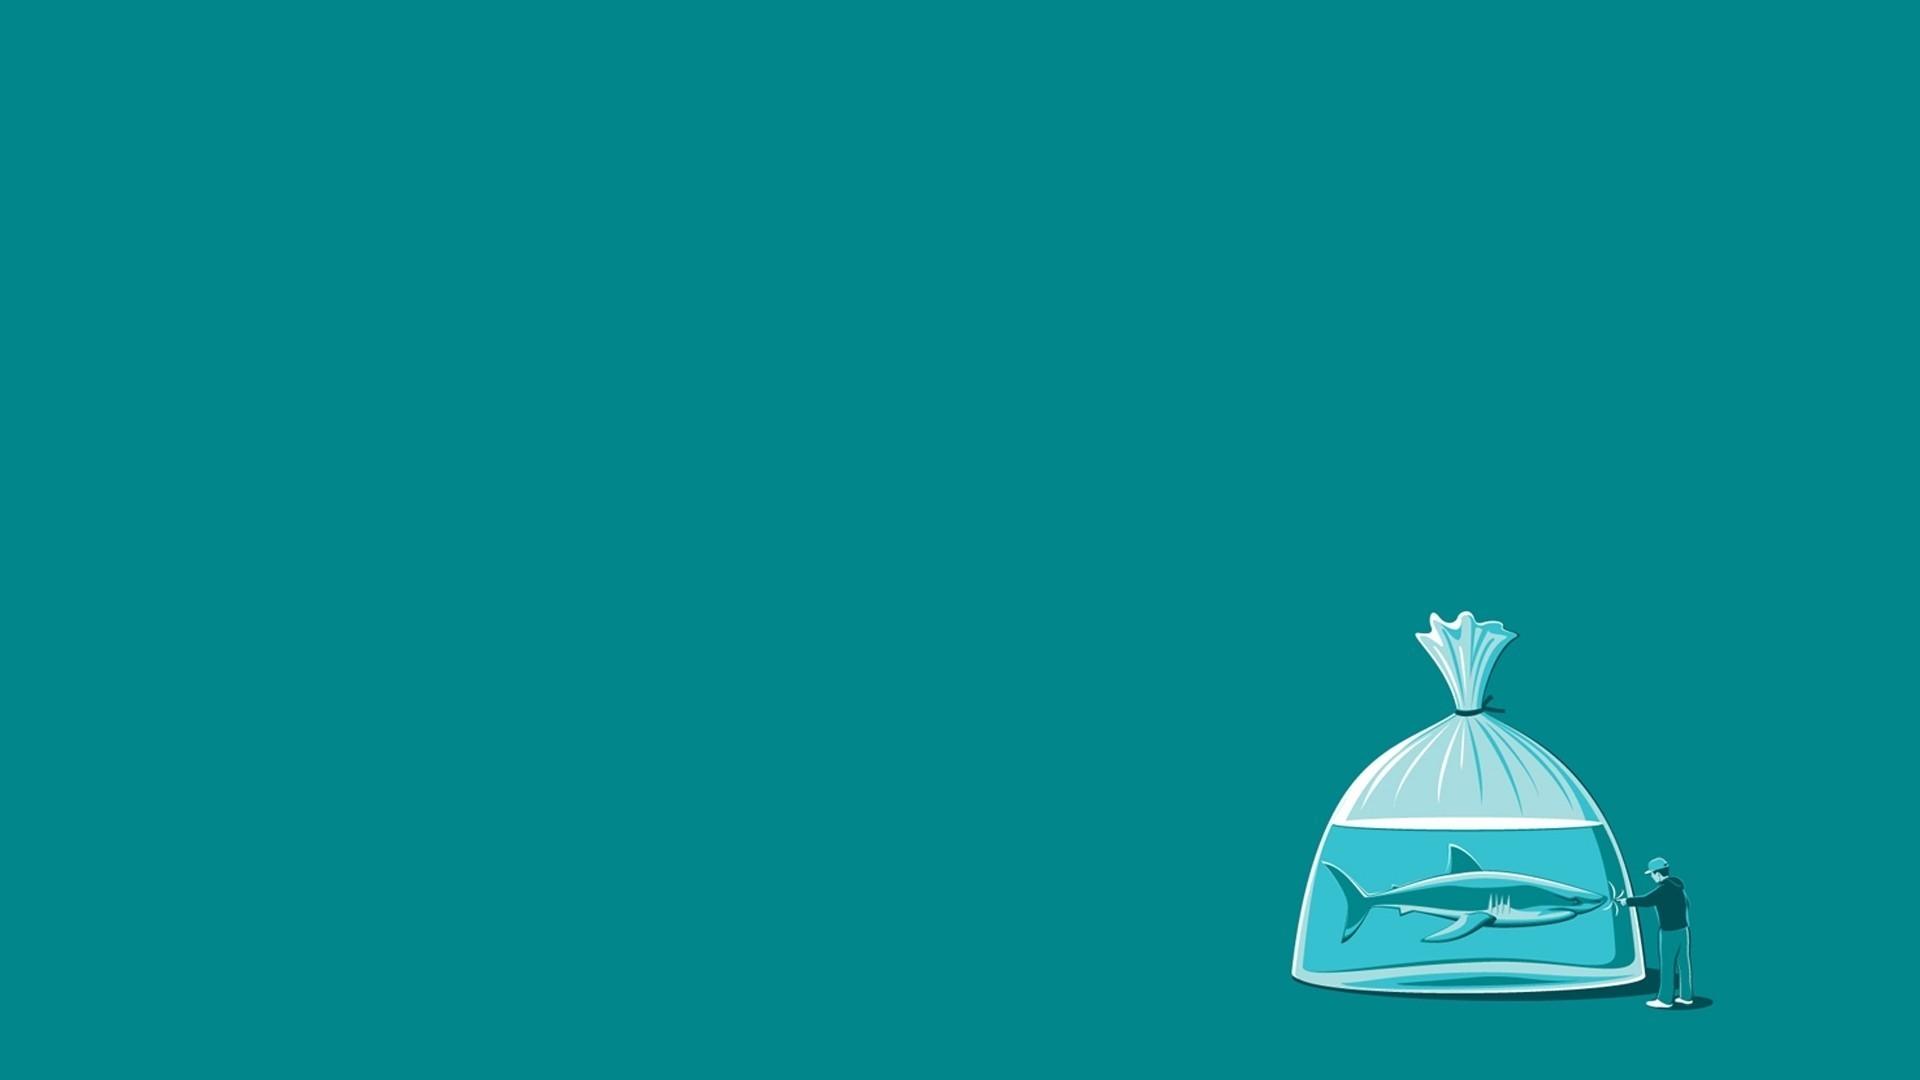 Humorous Wallpapers For Desktop Wallpapertag: Funny Screen Backgrounds ·① WallpaperTag